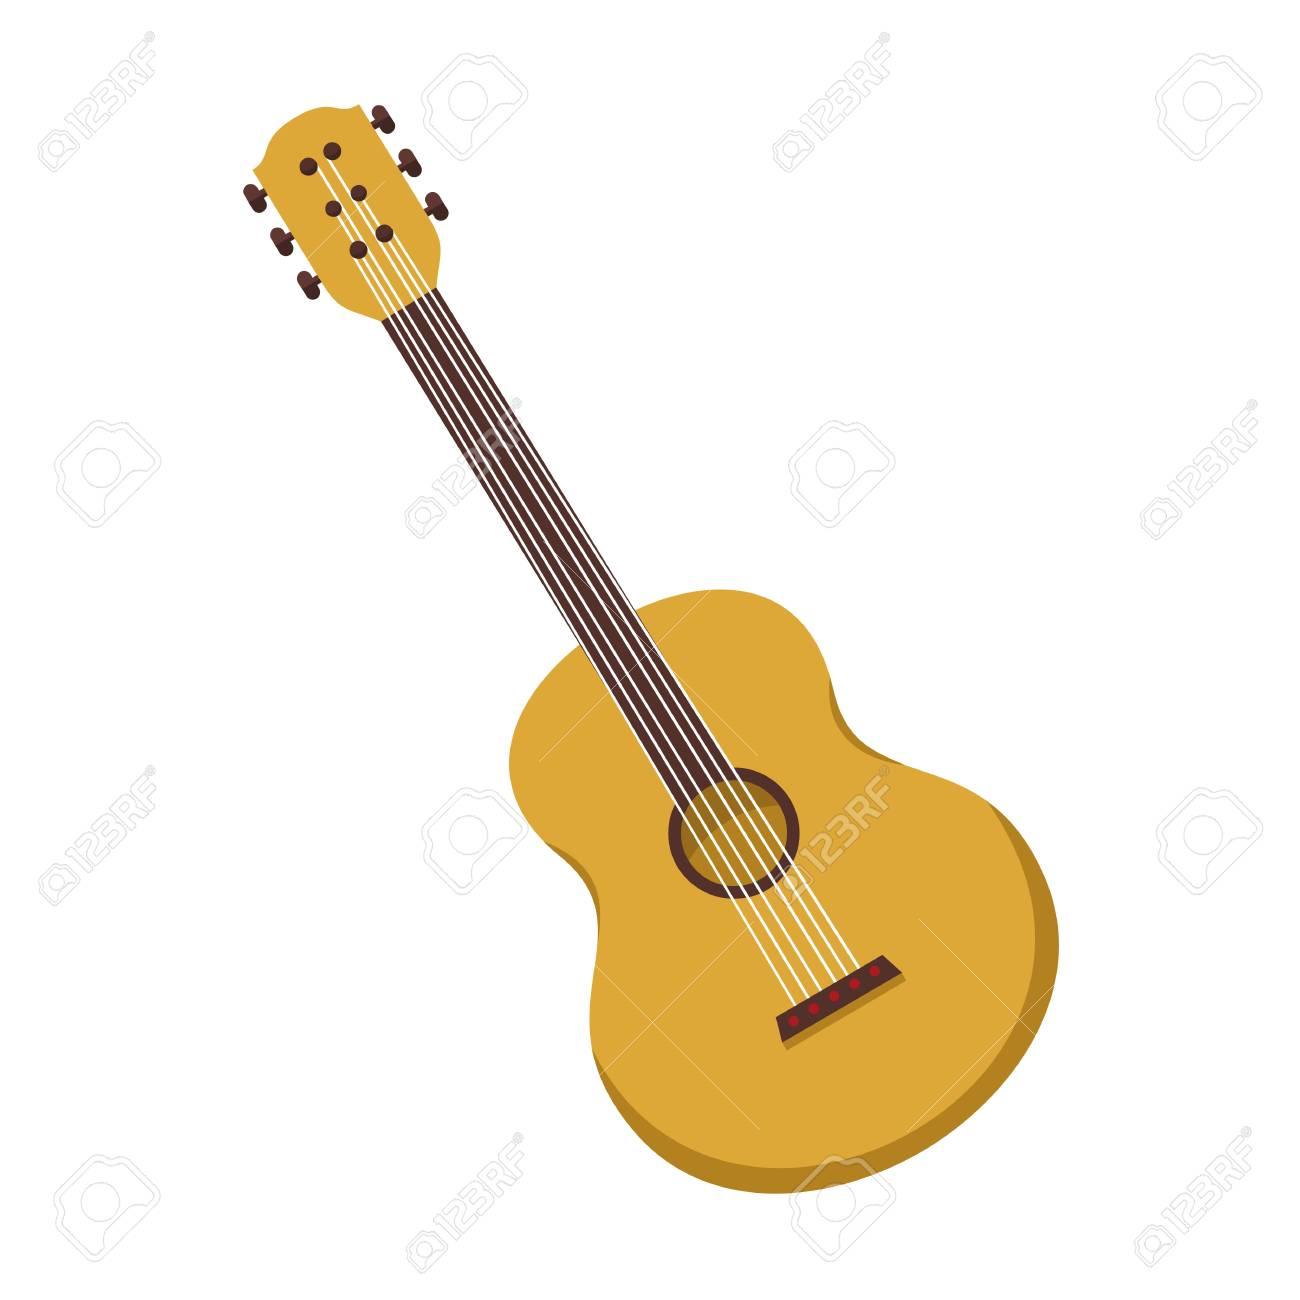 simple acoustic guitar vector illustration graphic design royalty rh 123rf com acoustic guitar silhouette vector free acoustic guitar vector icon